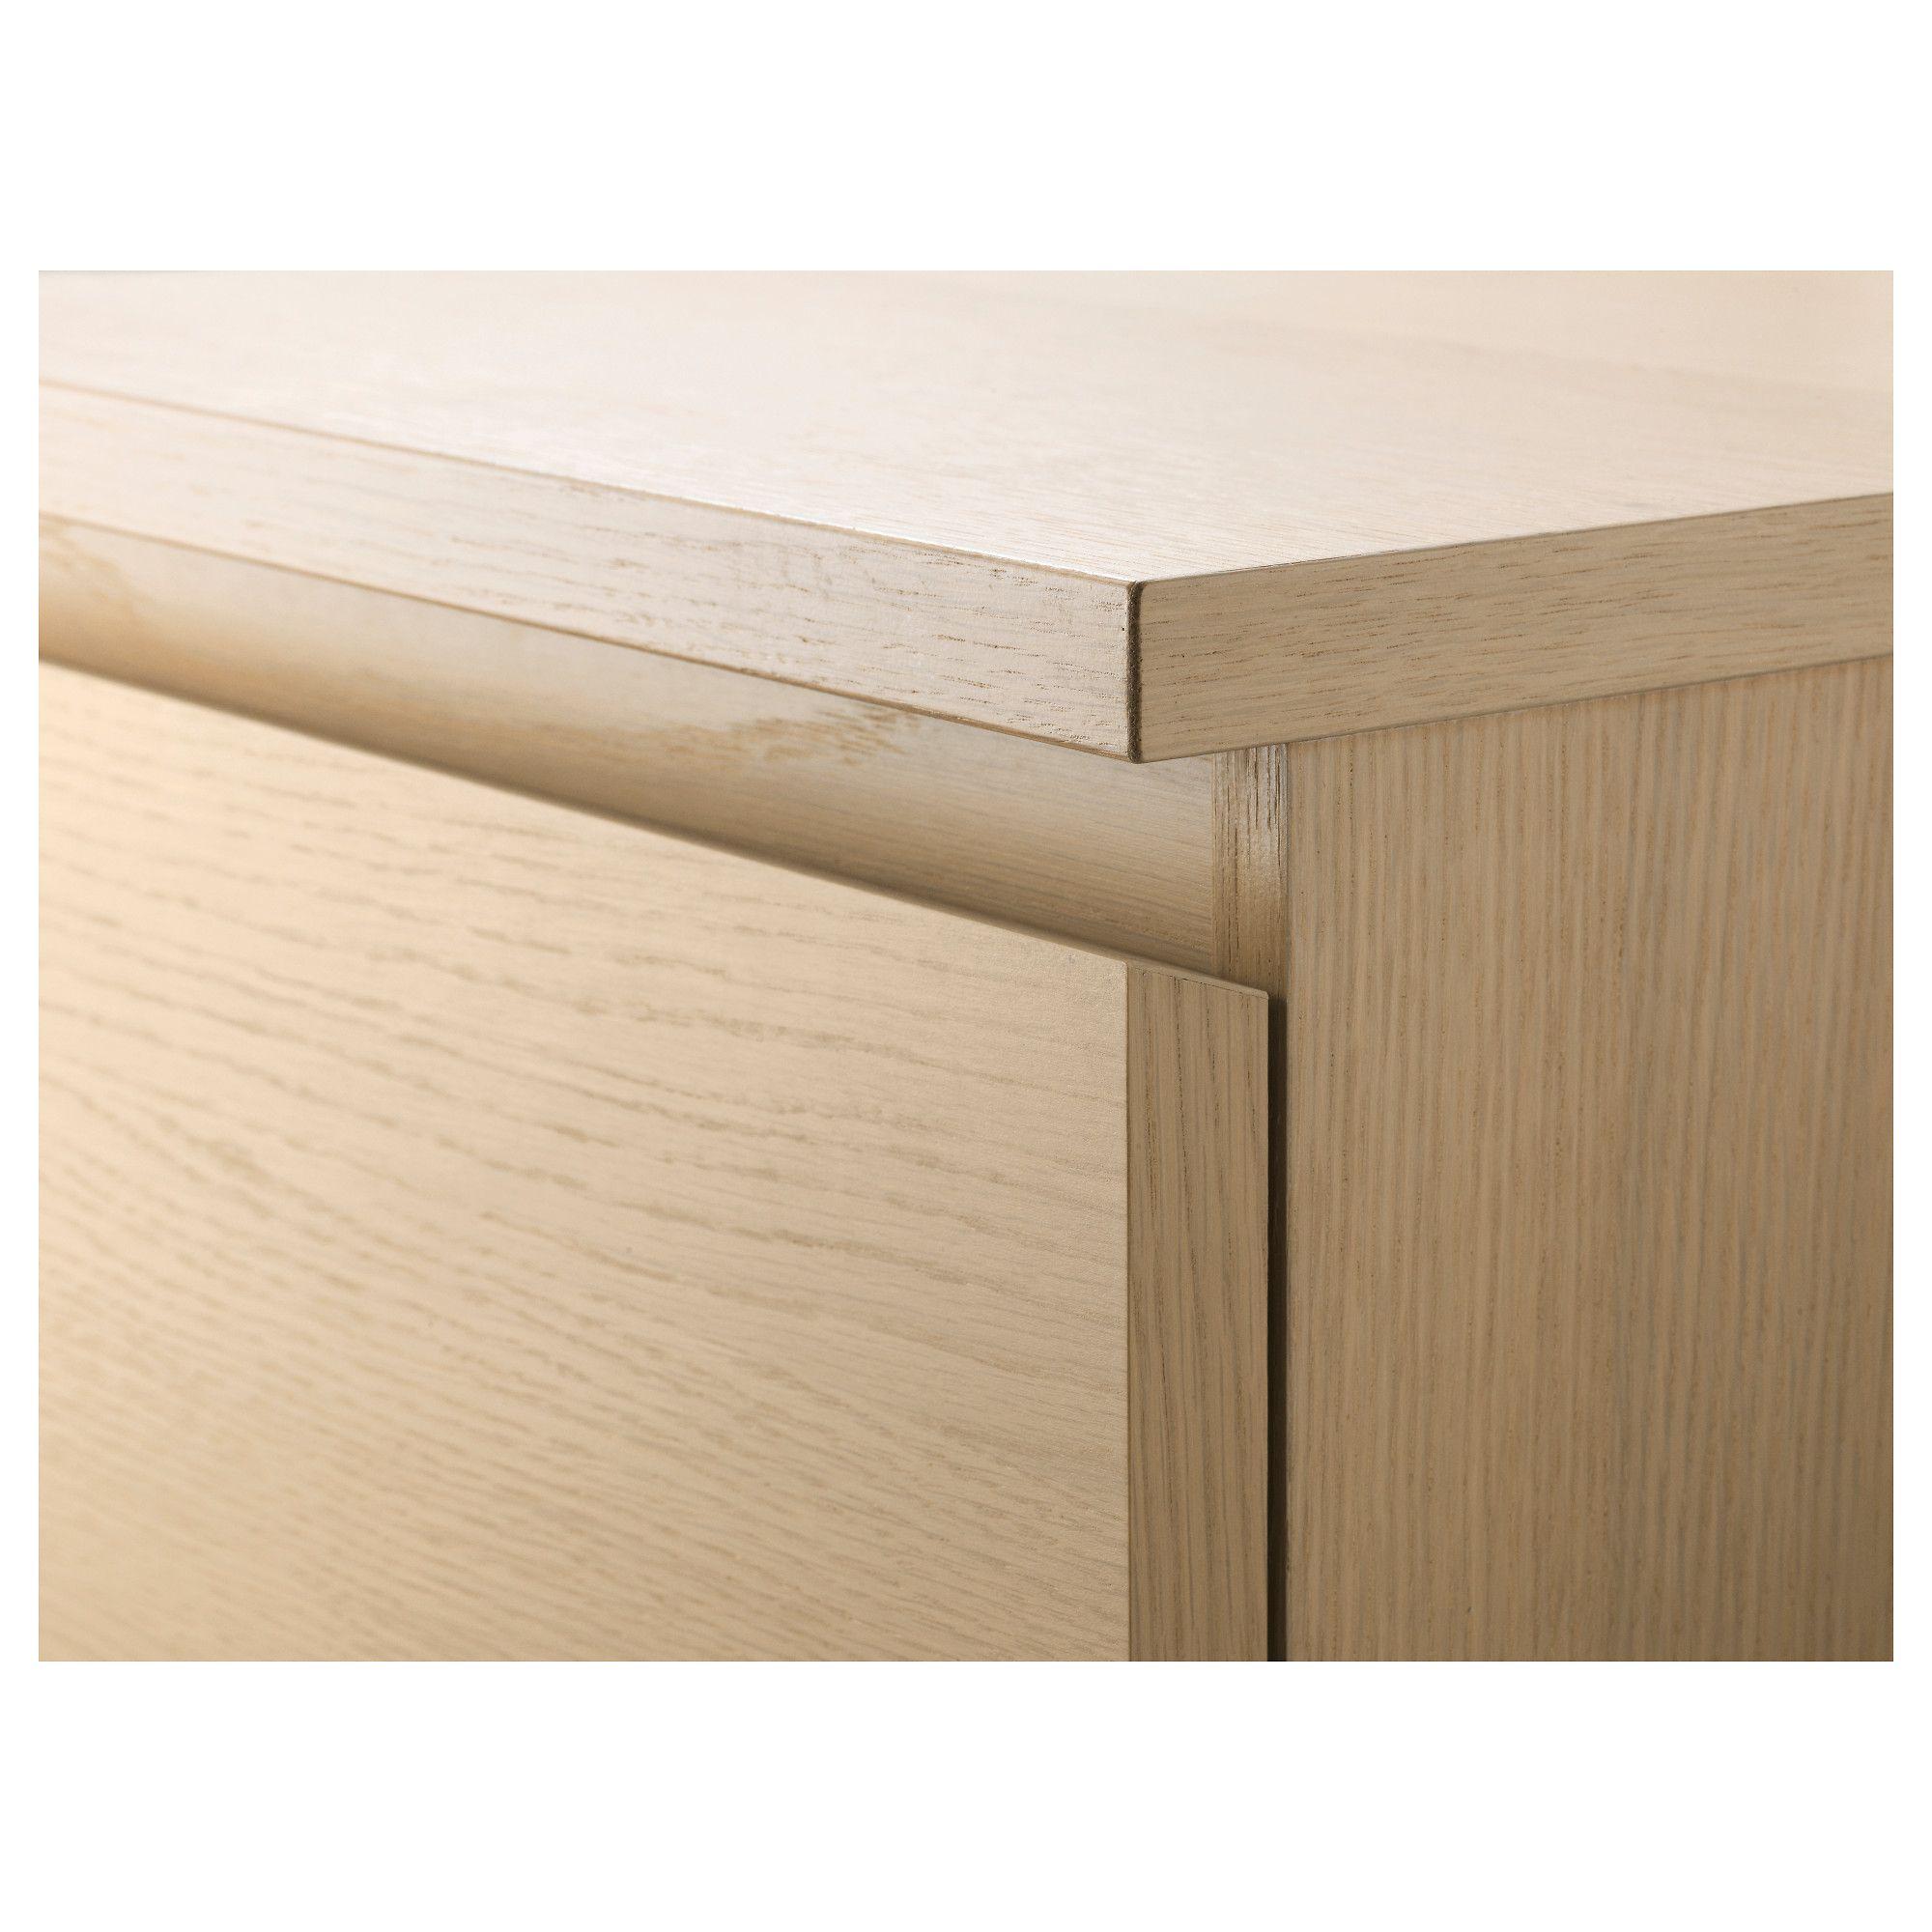 Best Ikea Malm 3 Drawer Chest White Stained Oak Veneer Ikea 400 x 300